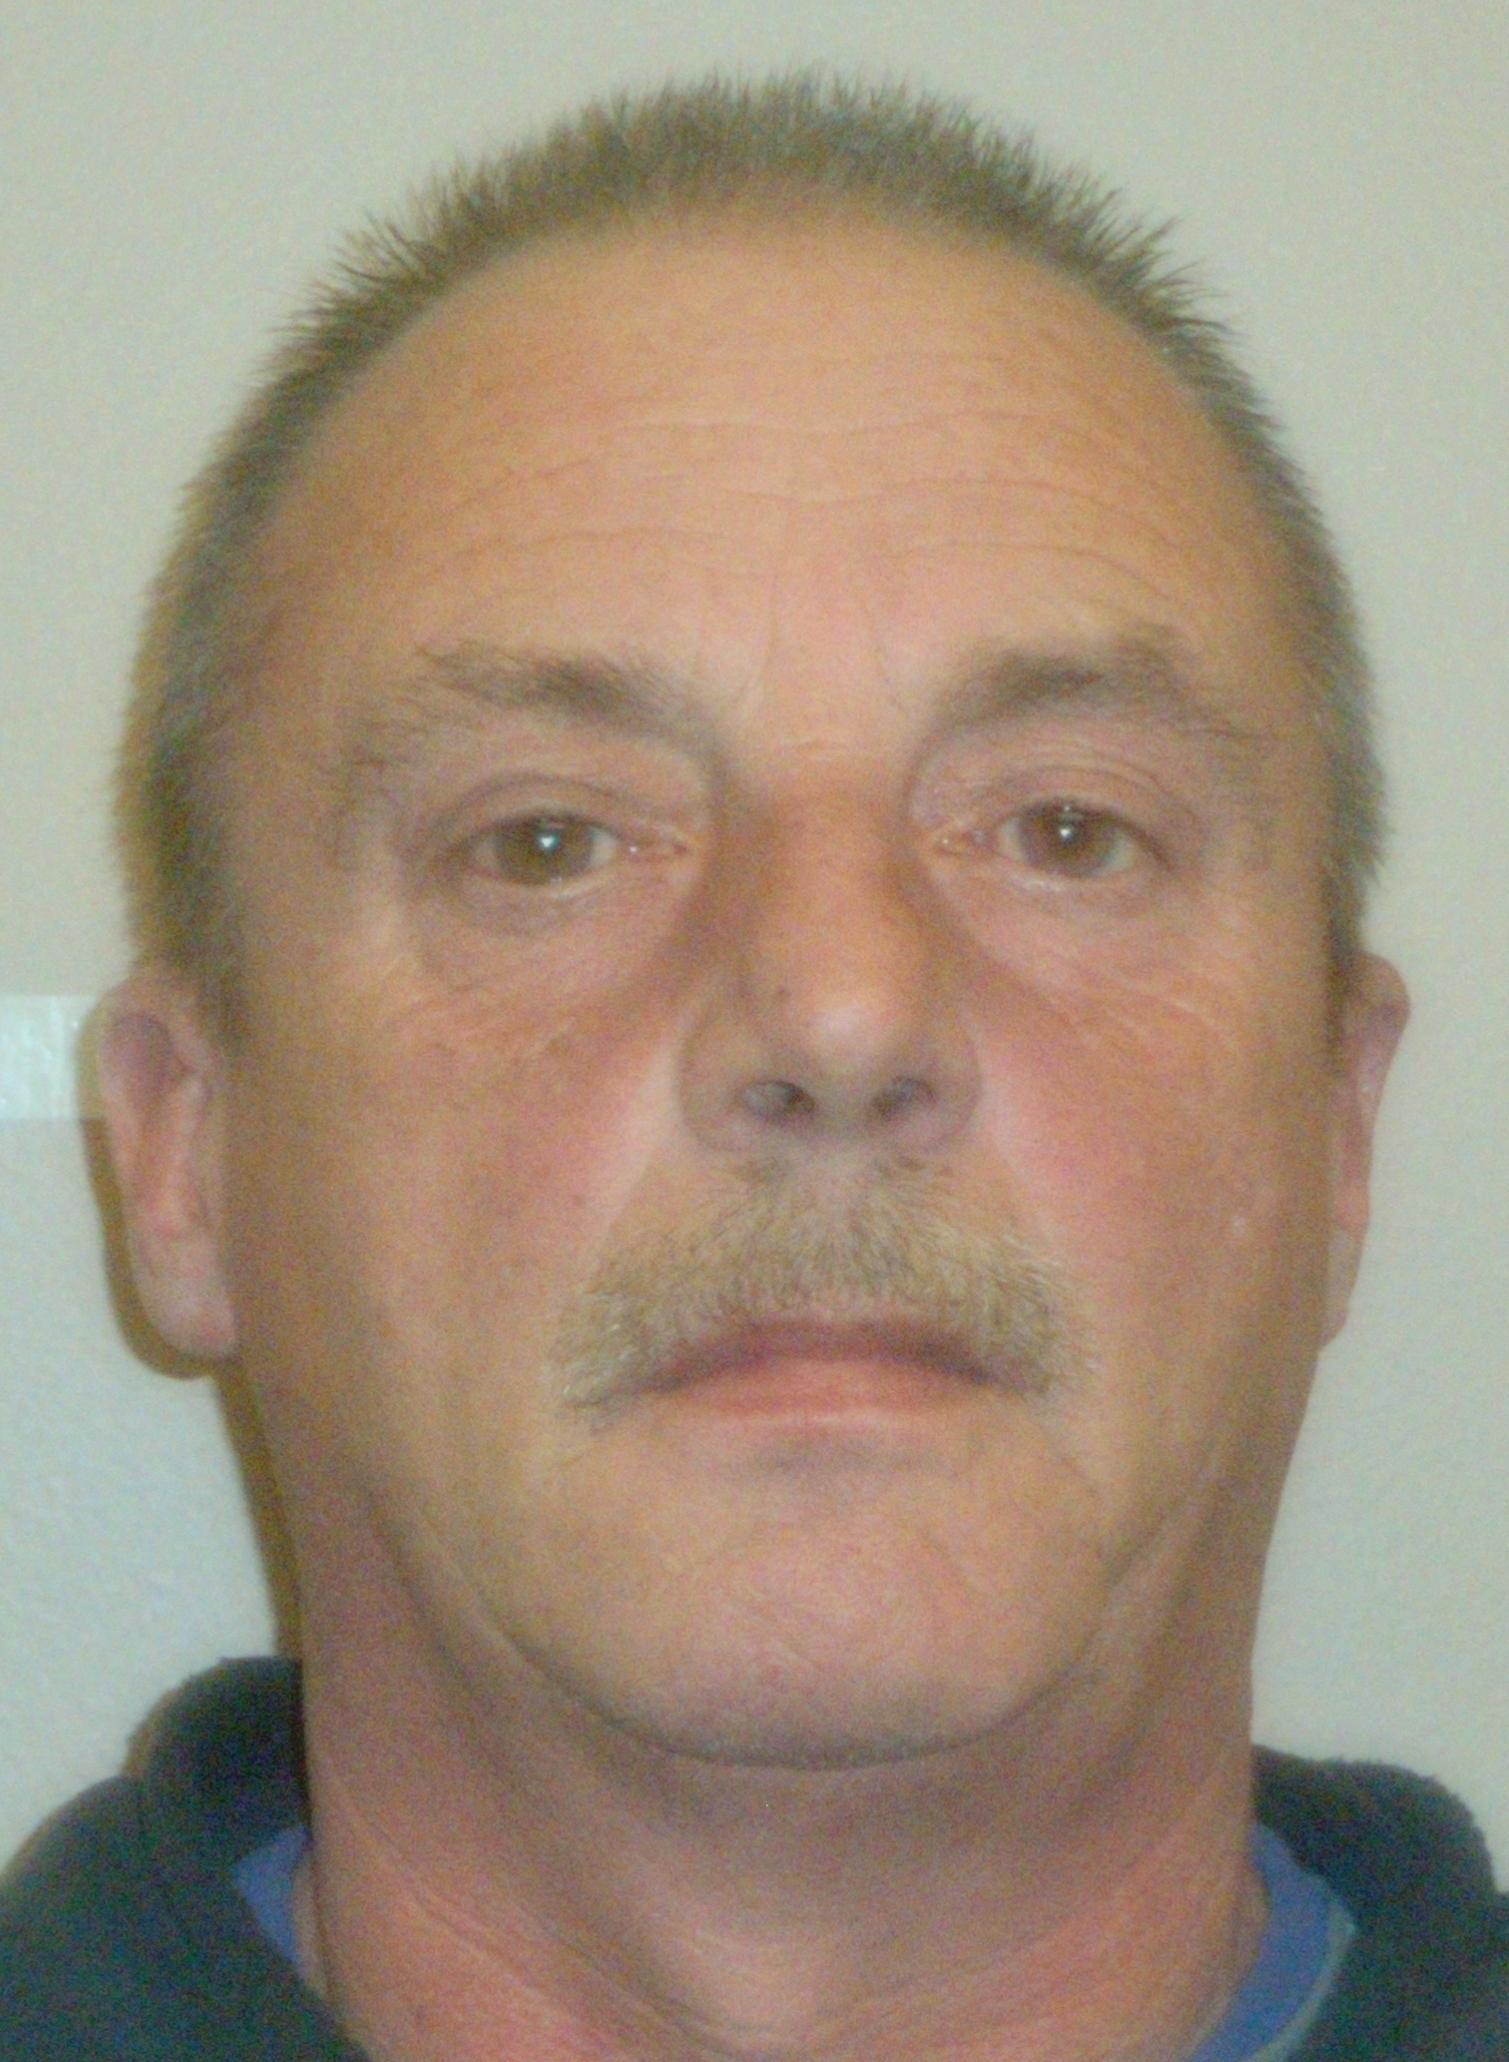 Sex offender registry smithtown ny